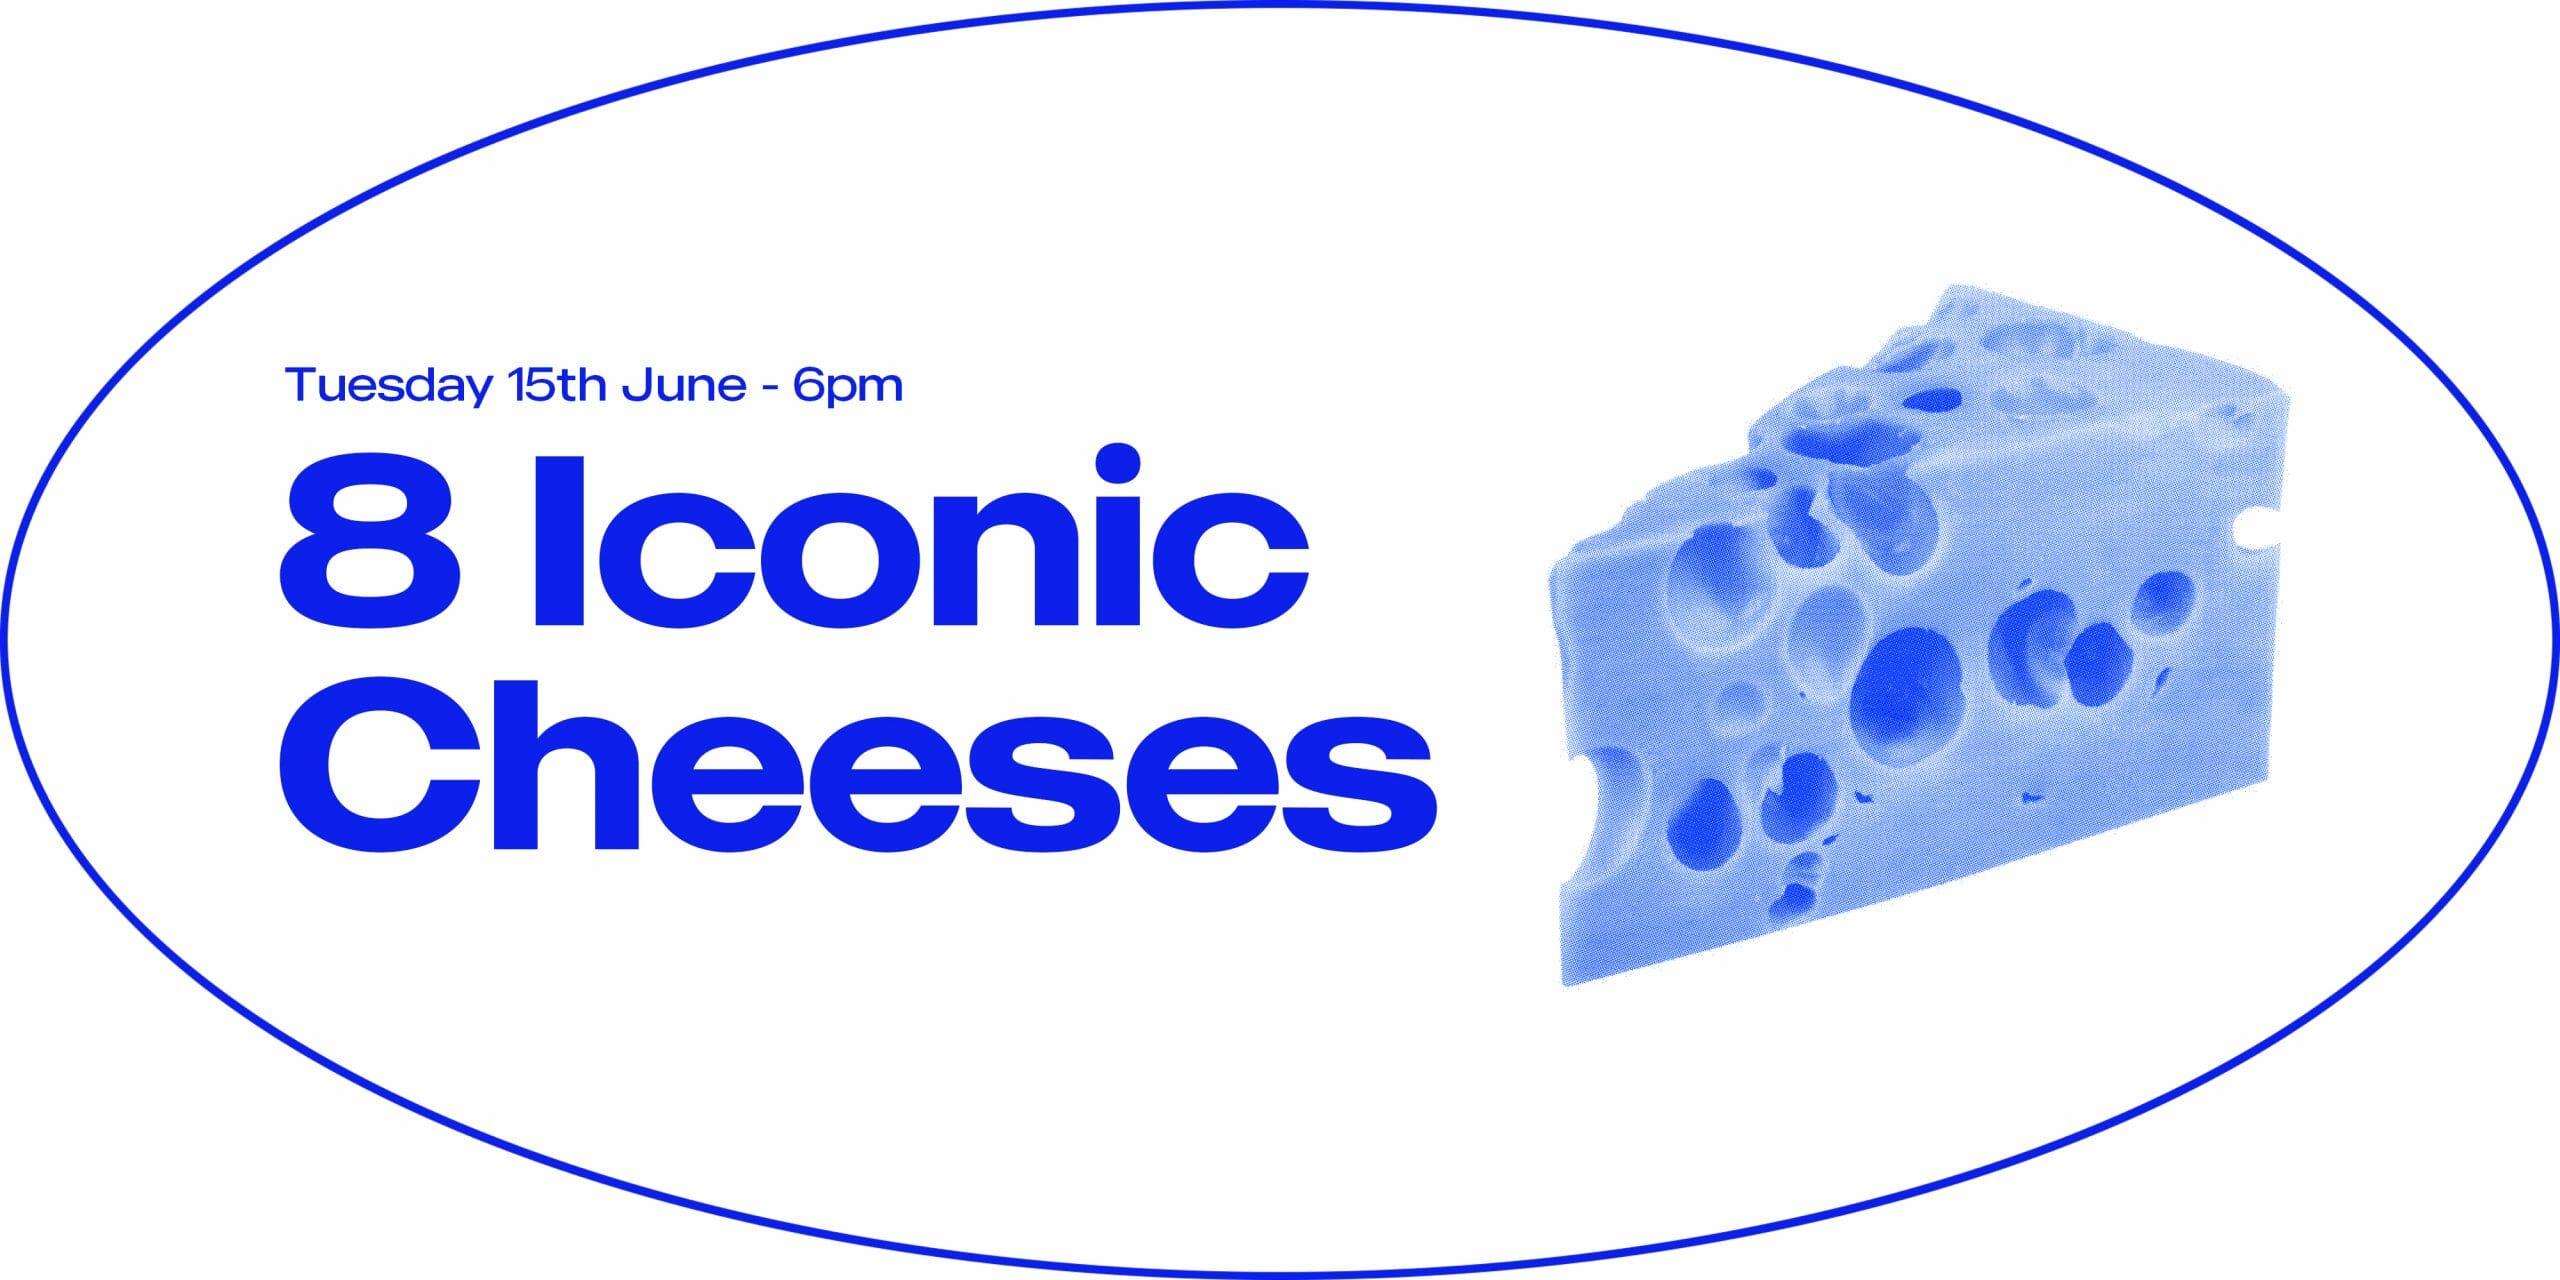 8 Iconic Cheeses